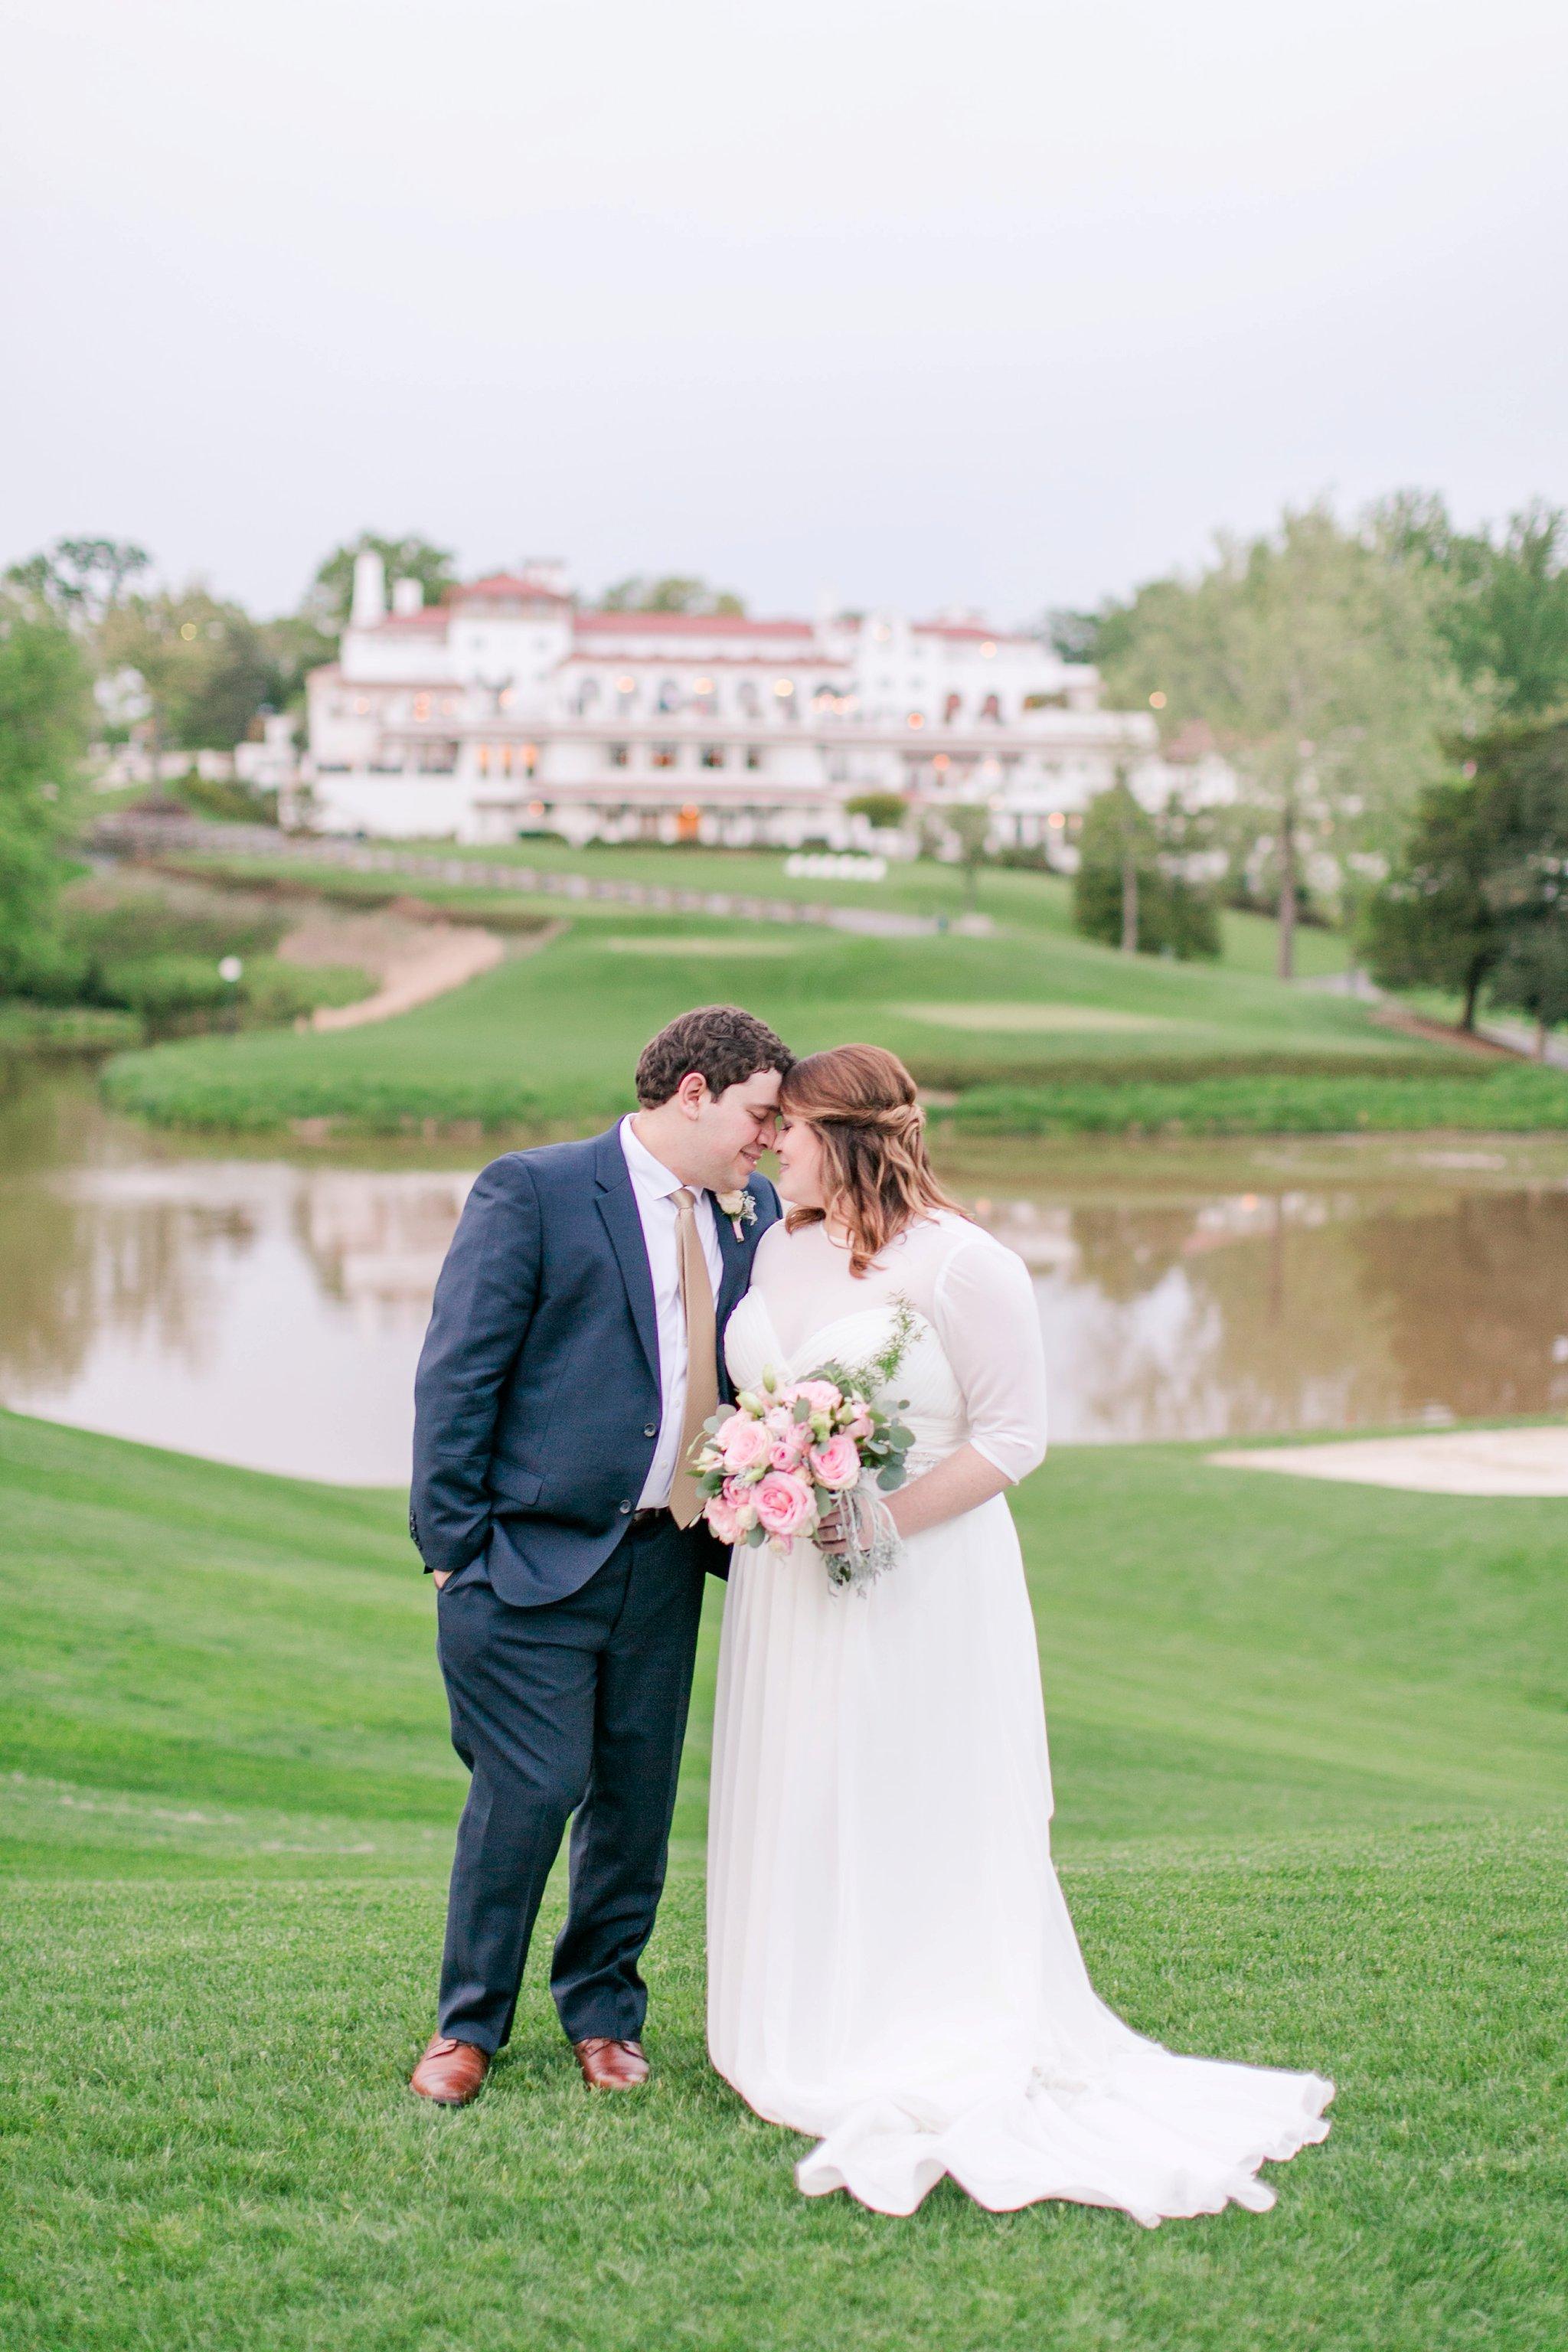 Congressional Country Club Wedding Photos DC Maryland Wedding Photographer Megan Kelsey Photography Kelly & Andrew-226.jpg